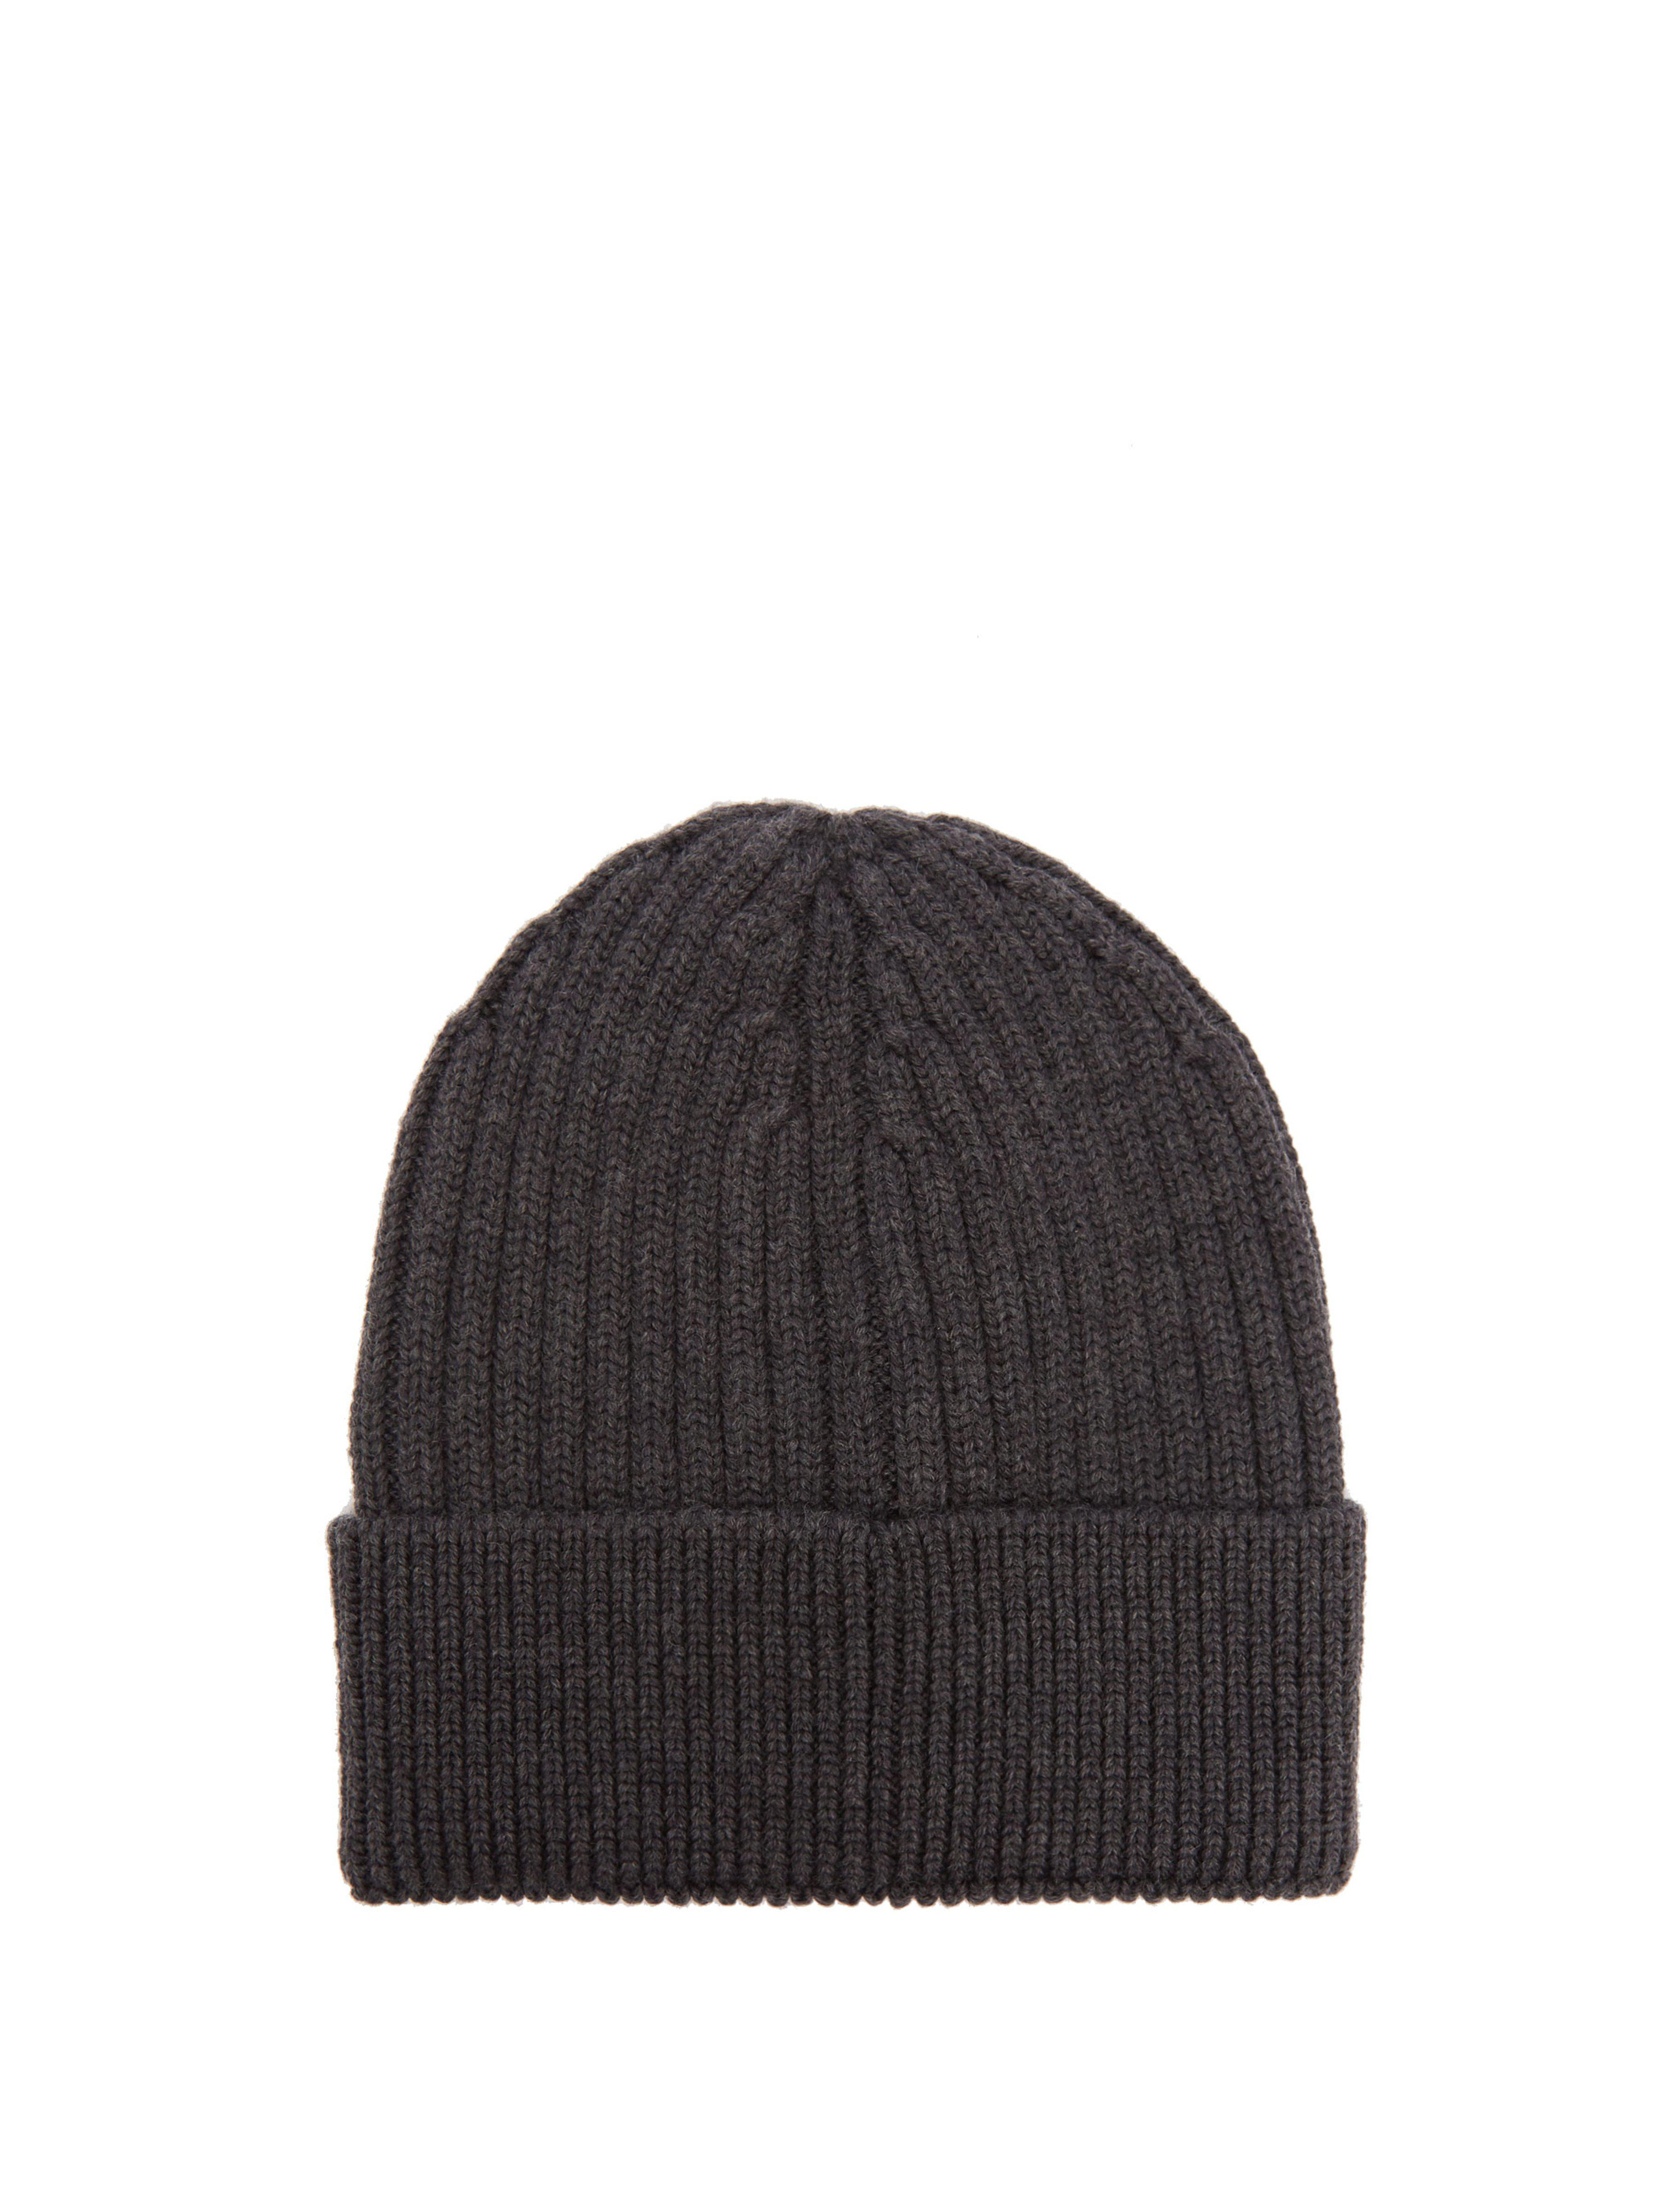 6851e5474e9 Moncler Grenoble Logo Embroidered Wool Beanie Hat in Gray for Men - Lyst